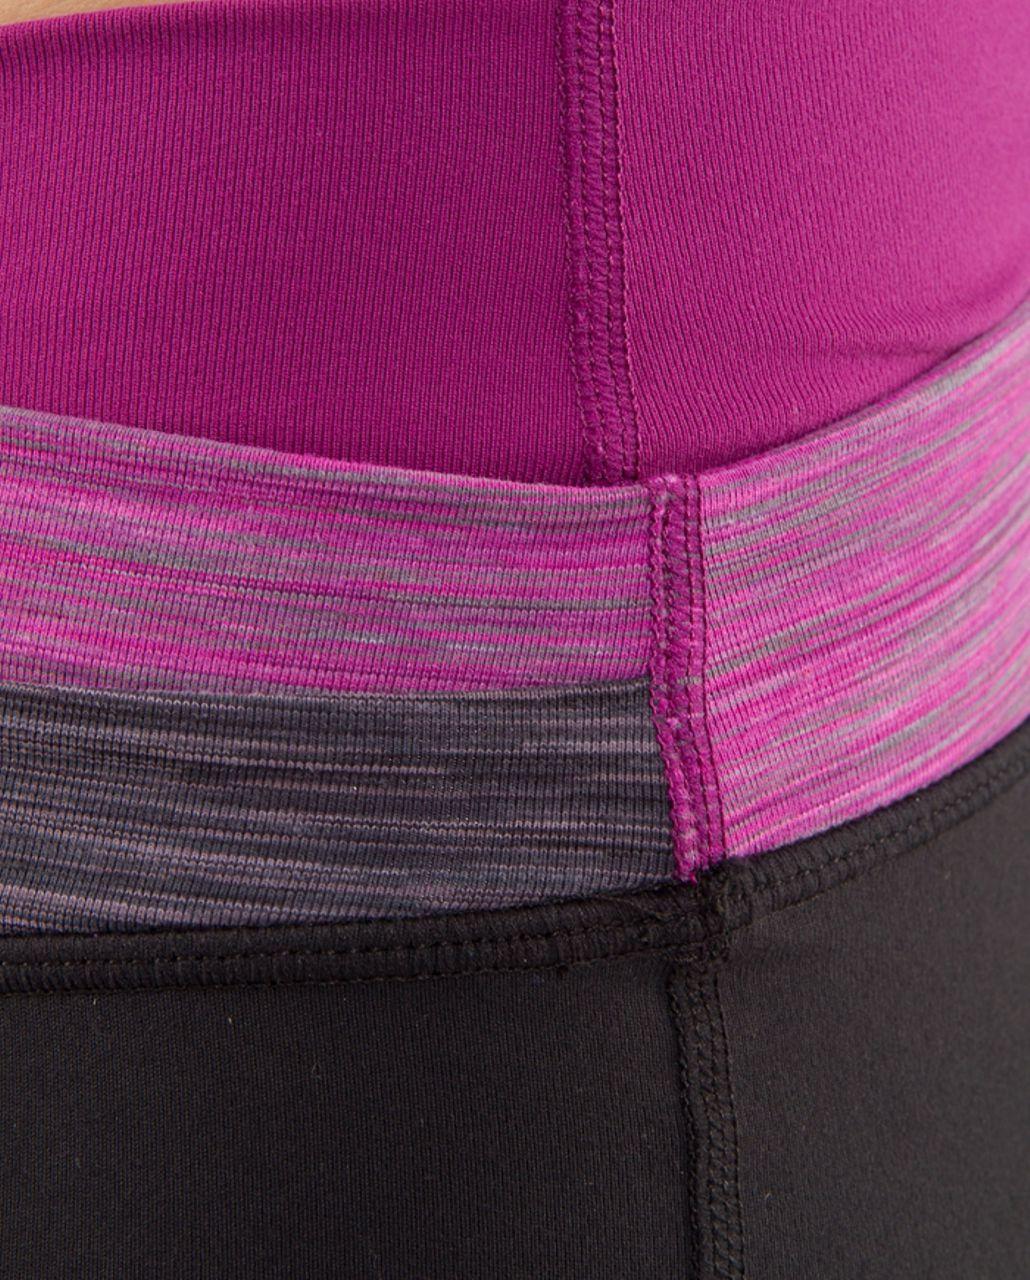 Lululemon Astro Pant (Regular) - Black /  Magnum Space Dye /  Dew Berry Space Dye